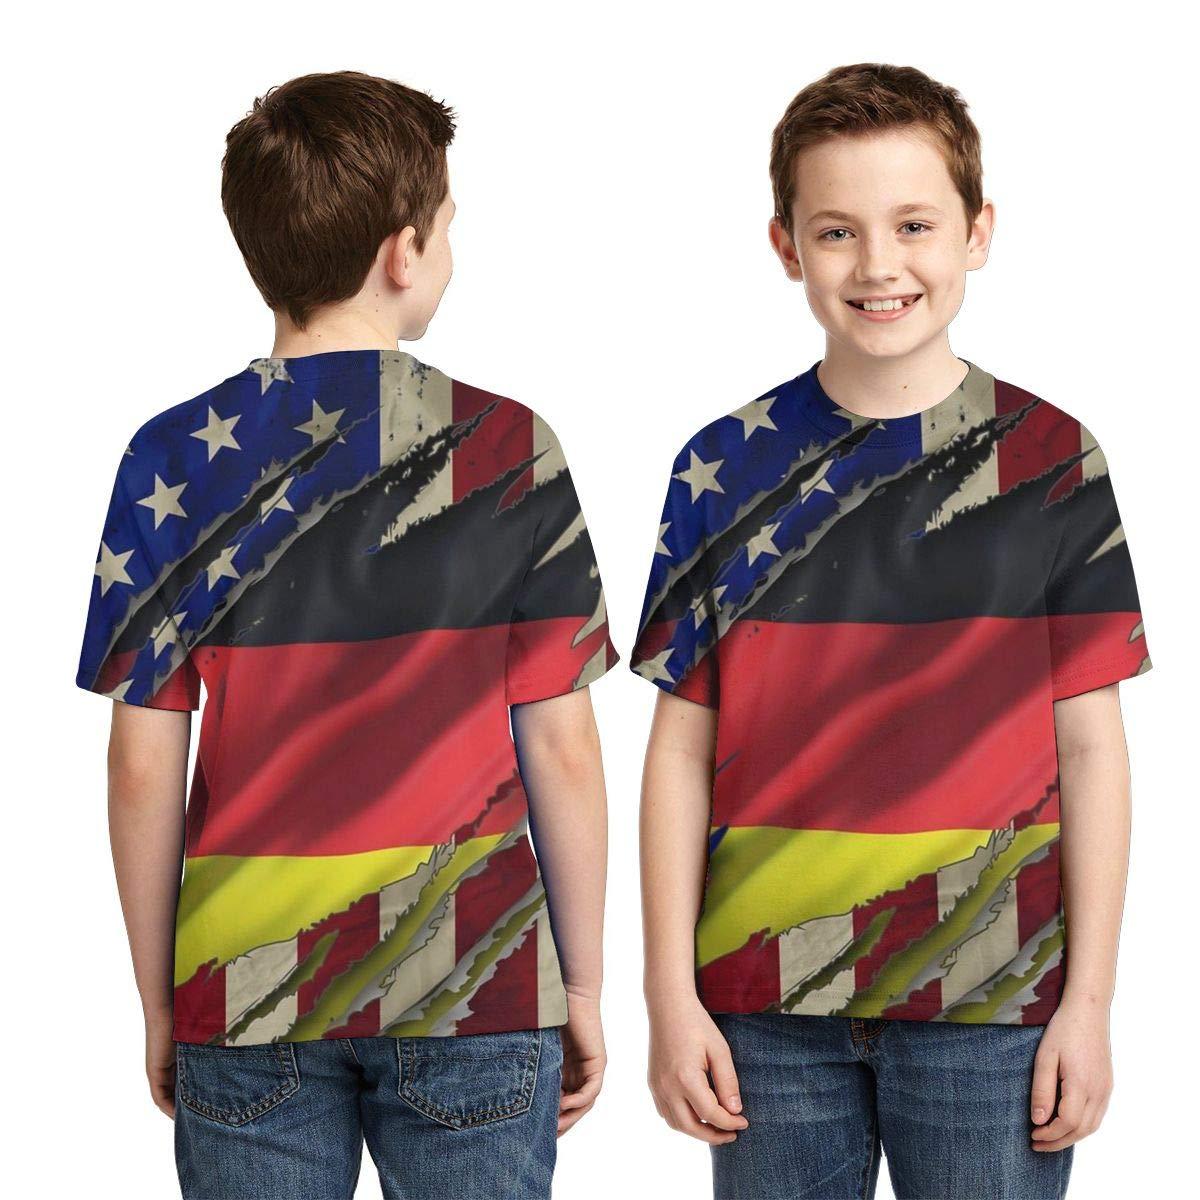 CERTONGCXTS Little Boys American Grown Uganda Root ComfortSoft Long Sleeve Tee